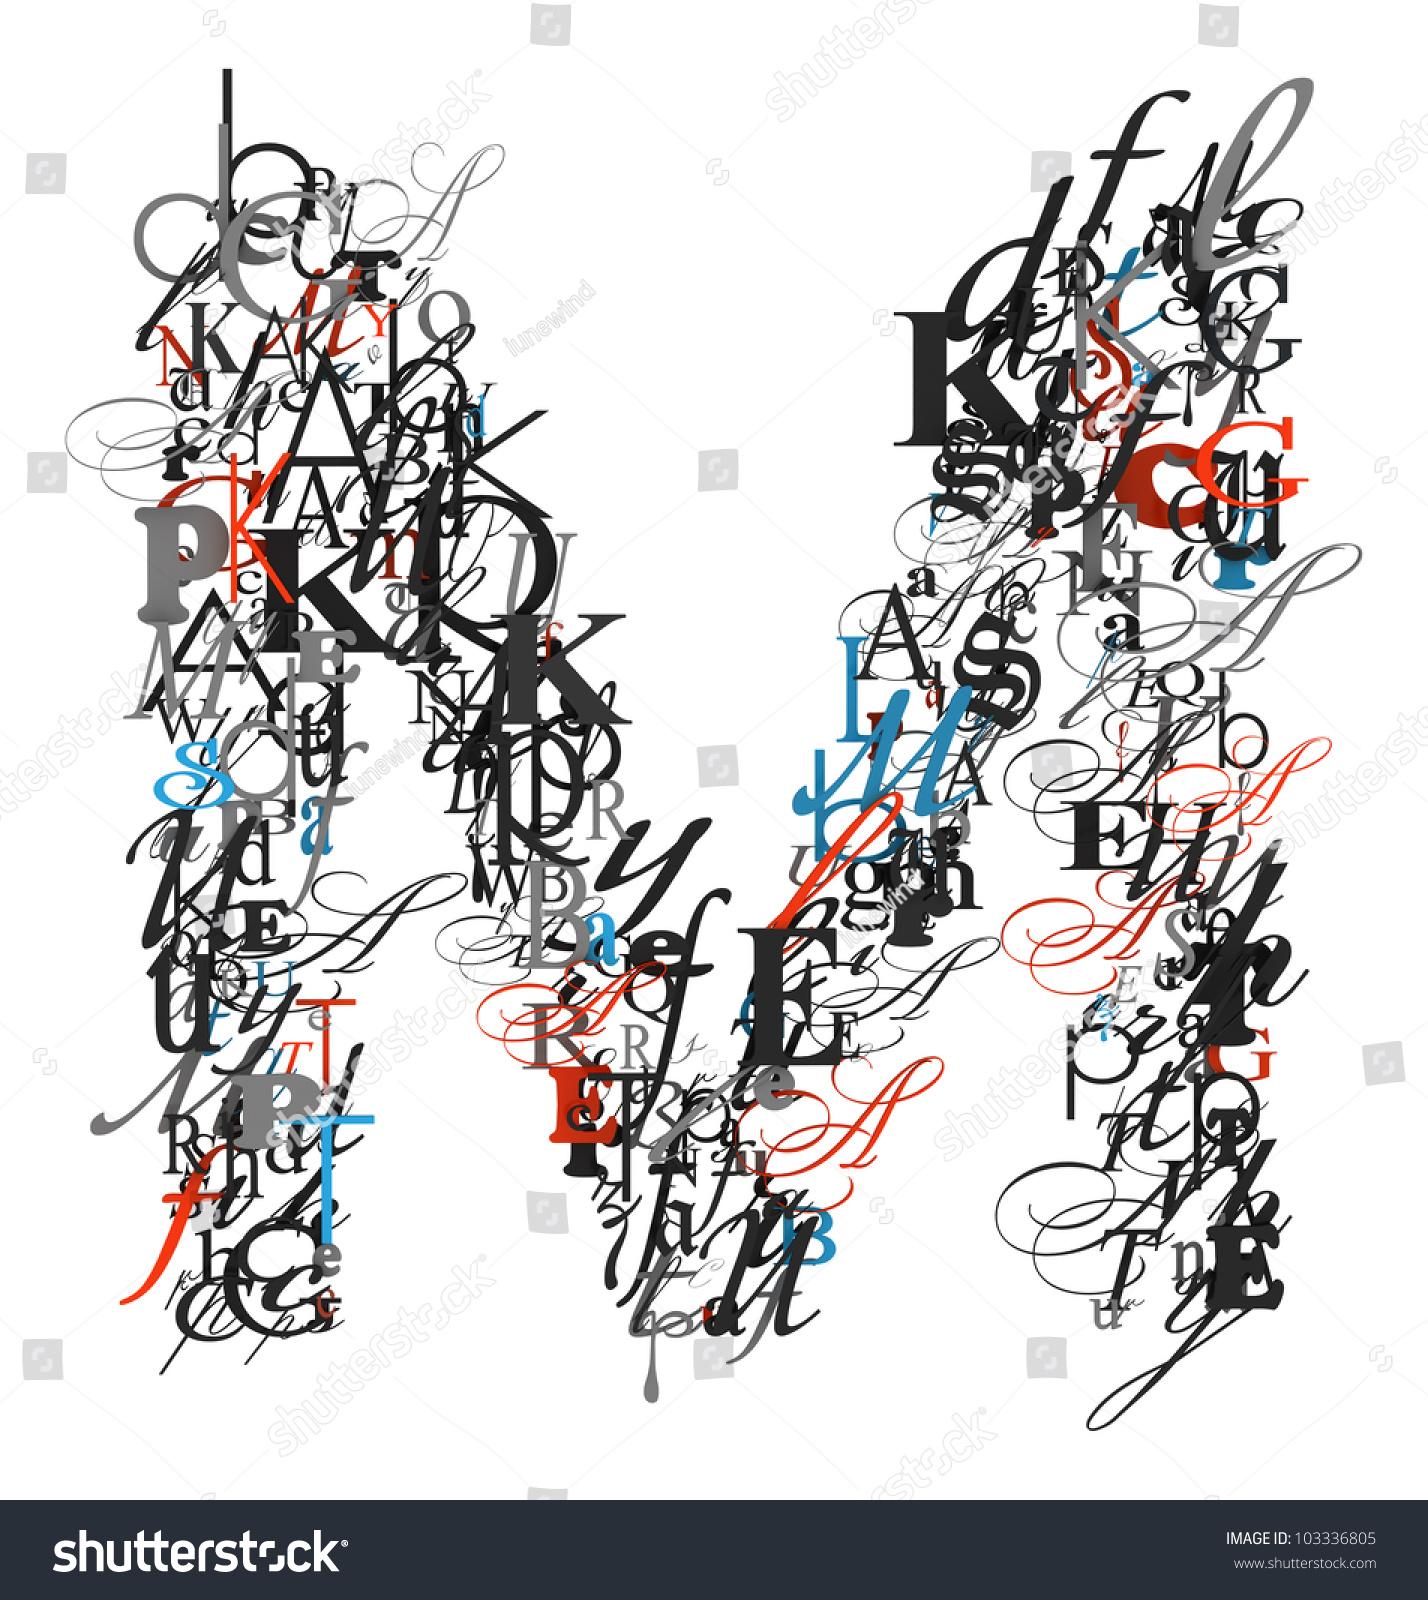 Royalty Free Stock Illustration Of Letter M Alphabet Different Font